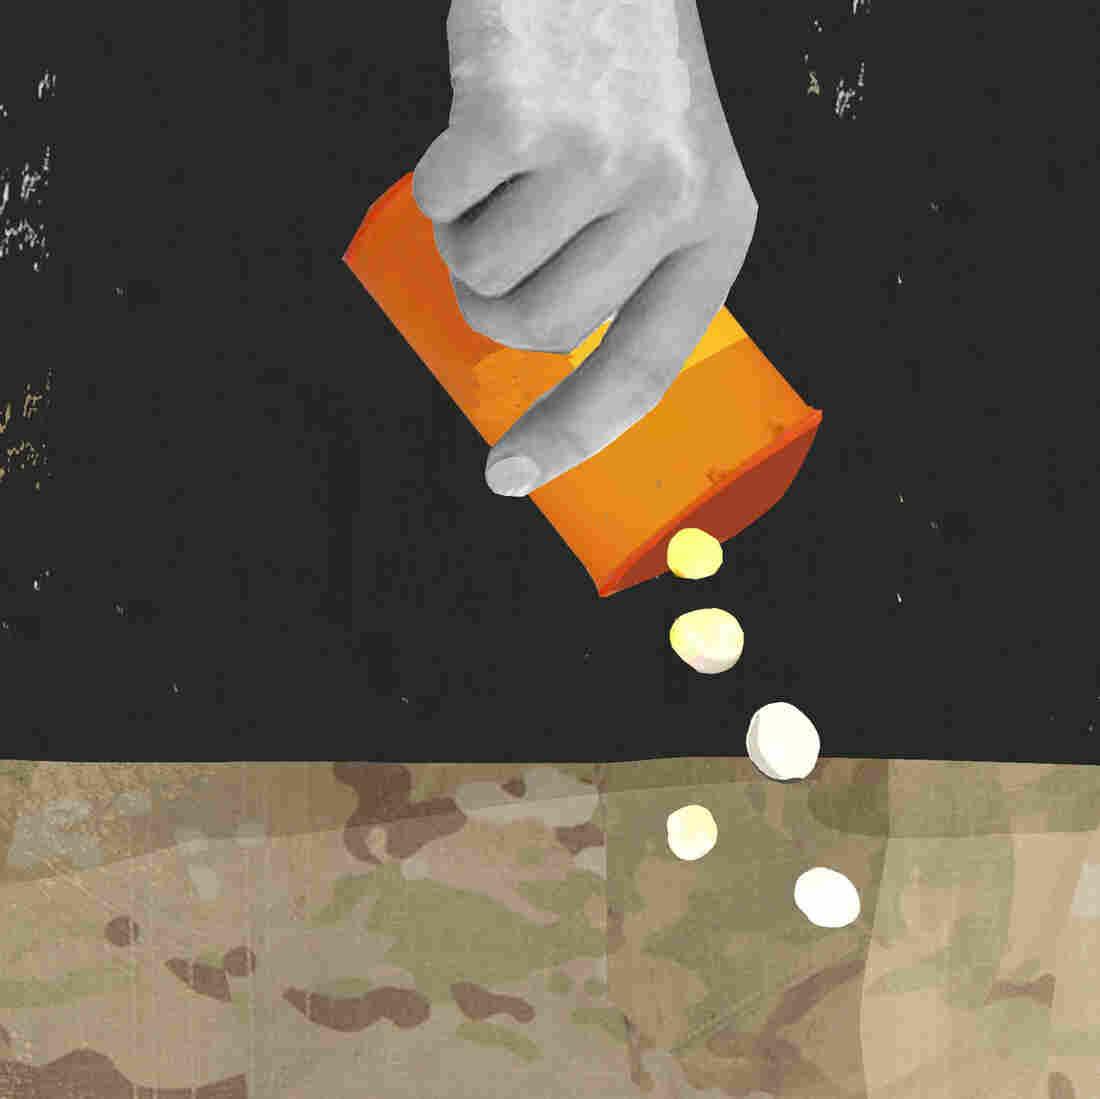 Veterans Kick The Prescription Pill Habit, Against Doctors' Orders